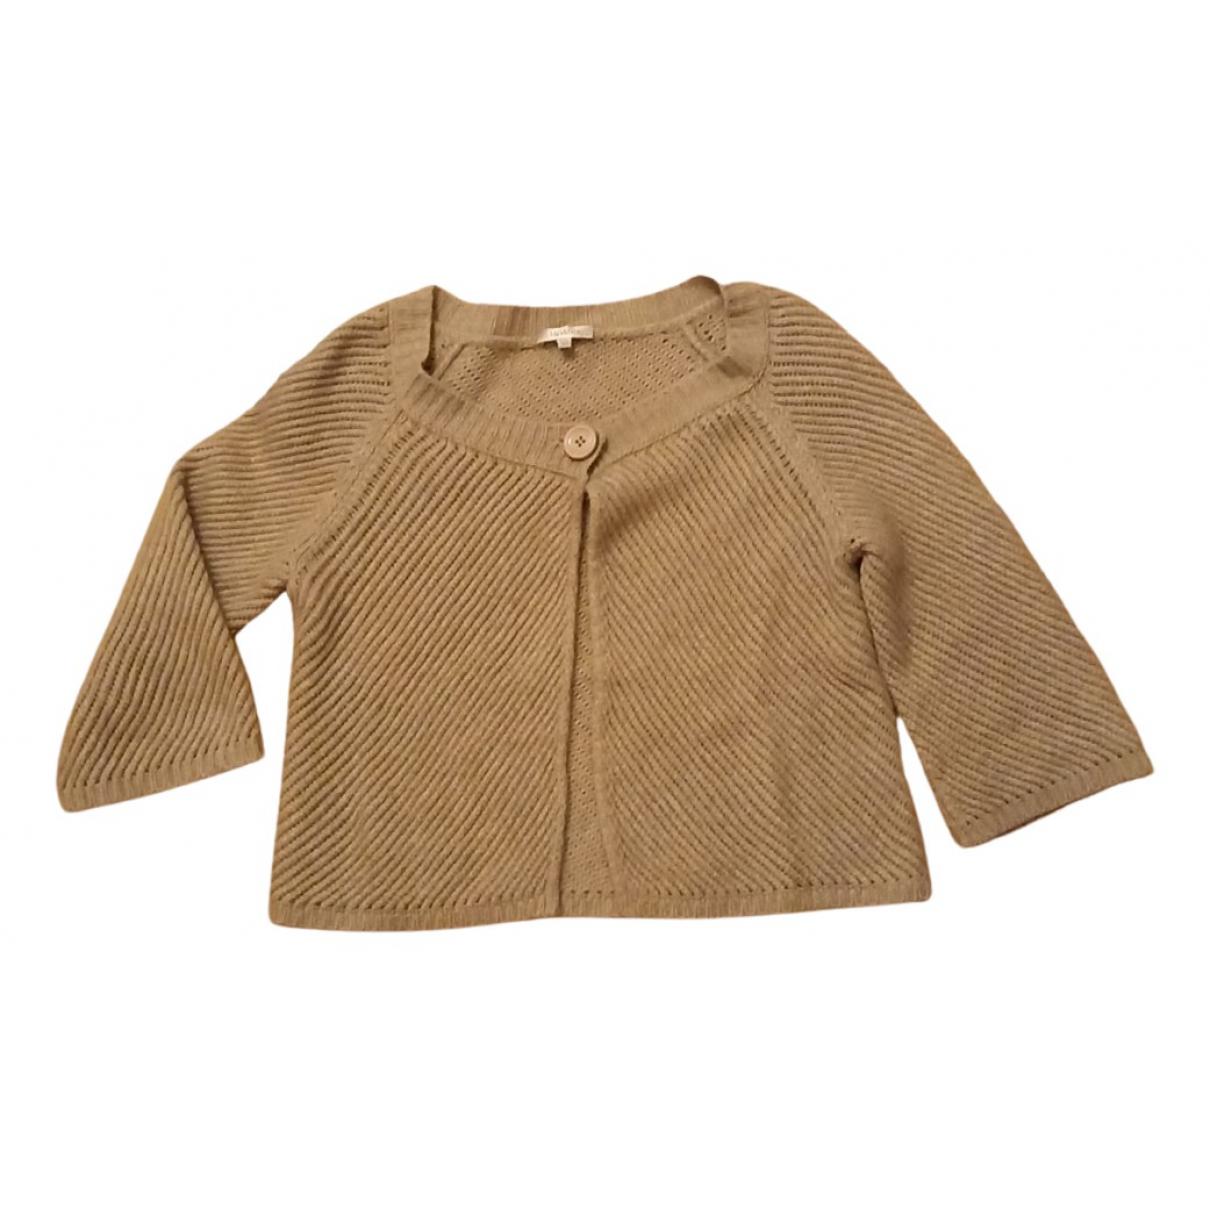 Max Mara N Ecru Cashmere Knitwear for Women M International